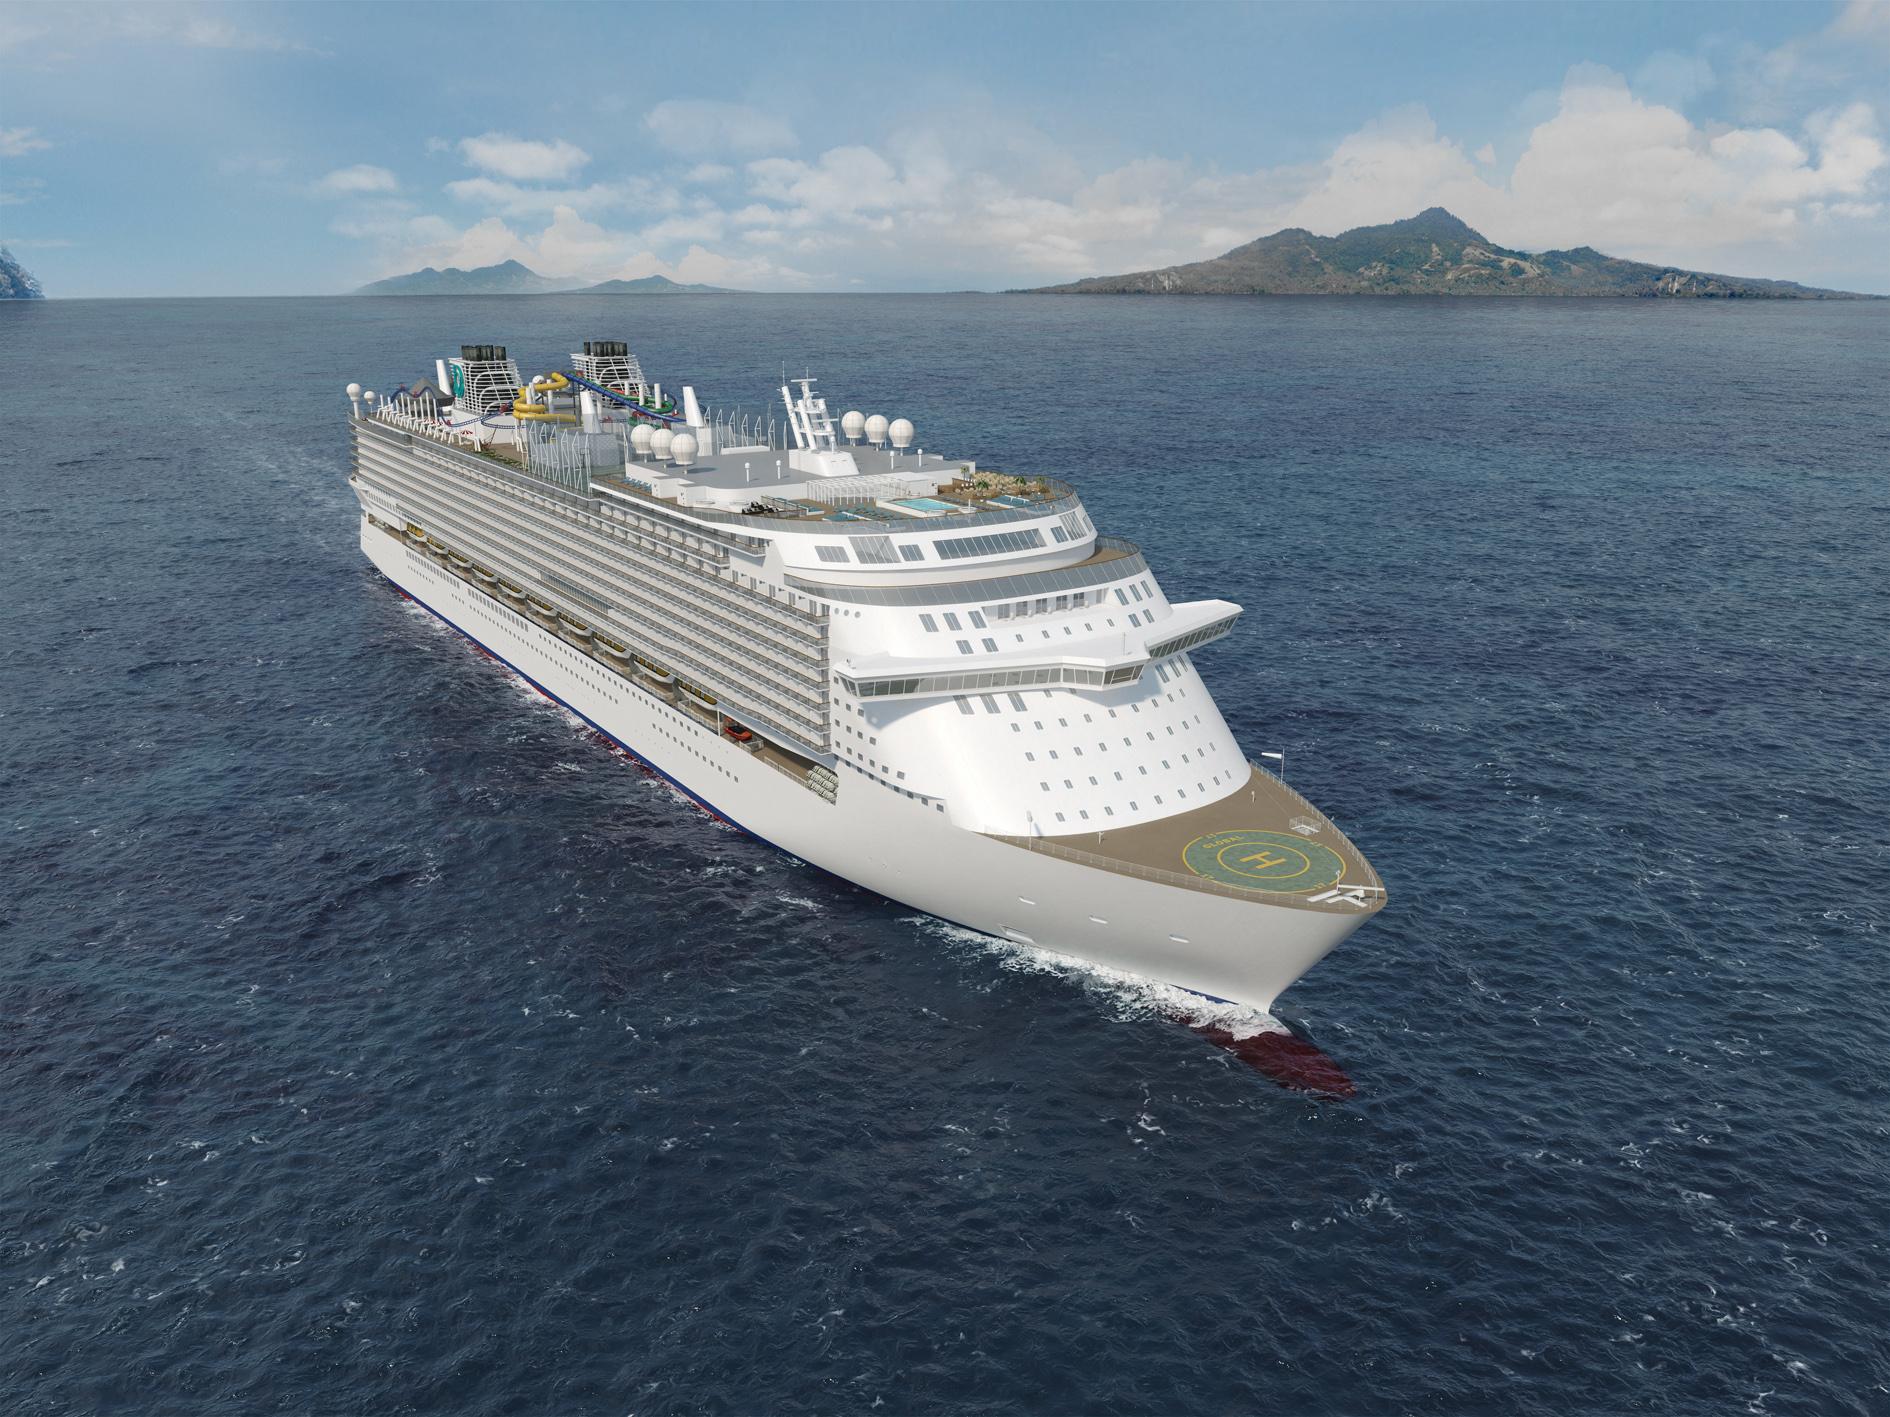 MV Werften Global Class-skib.